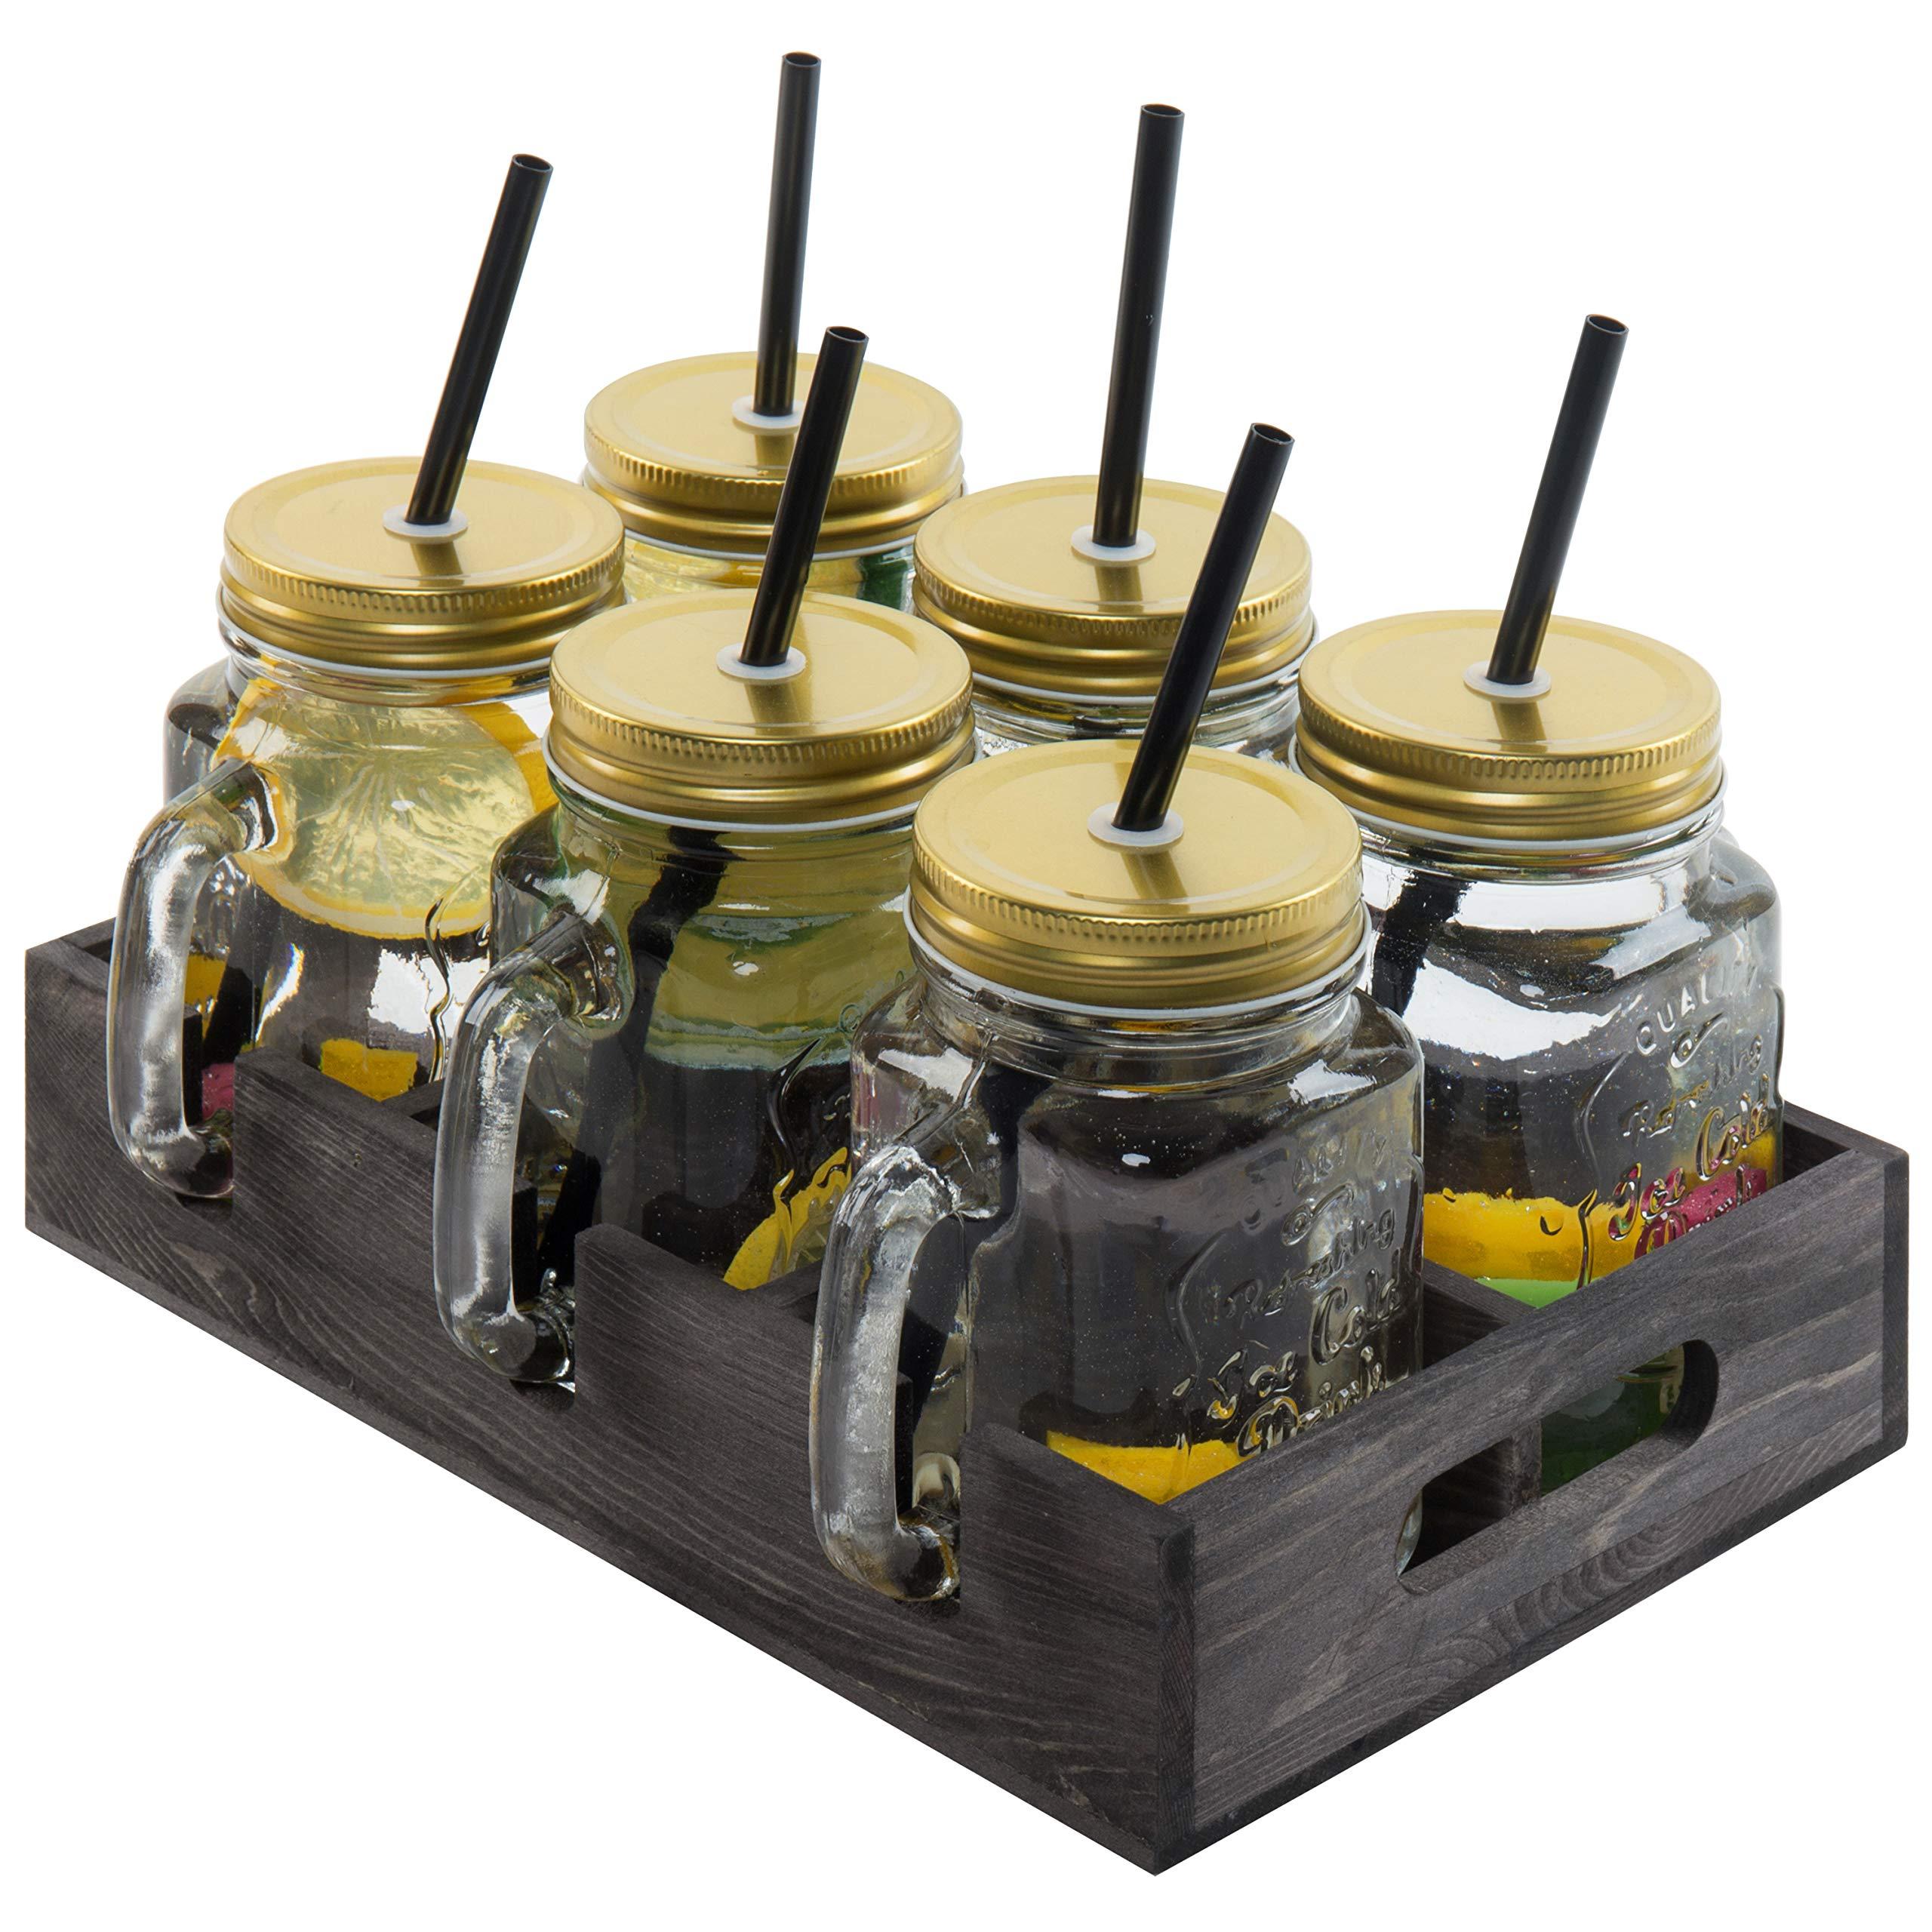 MyGift Mason Jar Mug Glasses with Lids, Straws & Wood Caddy, Coffee, Set of 6 by MyGift